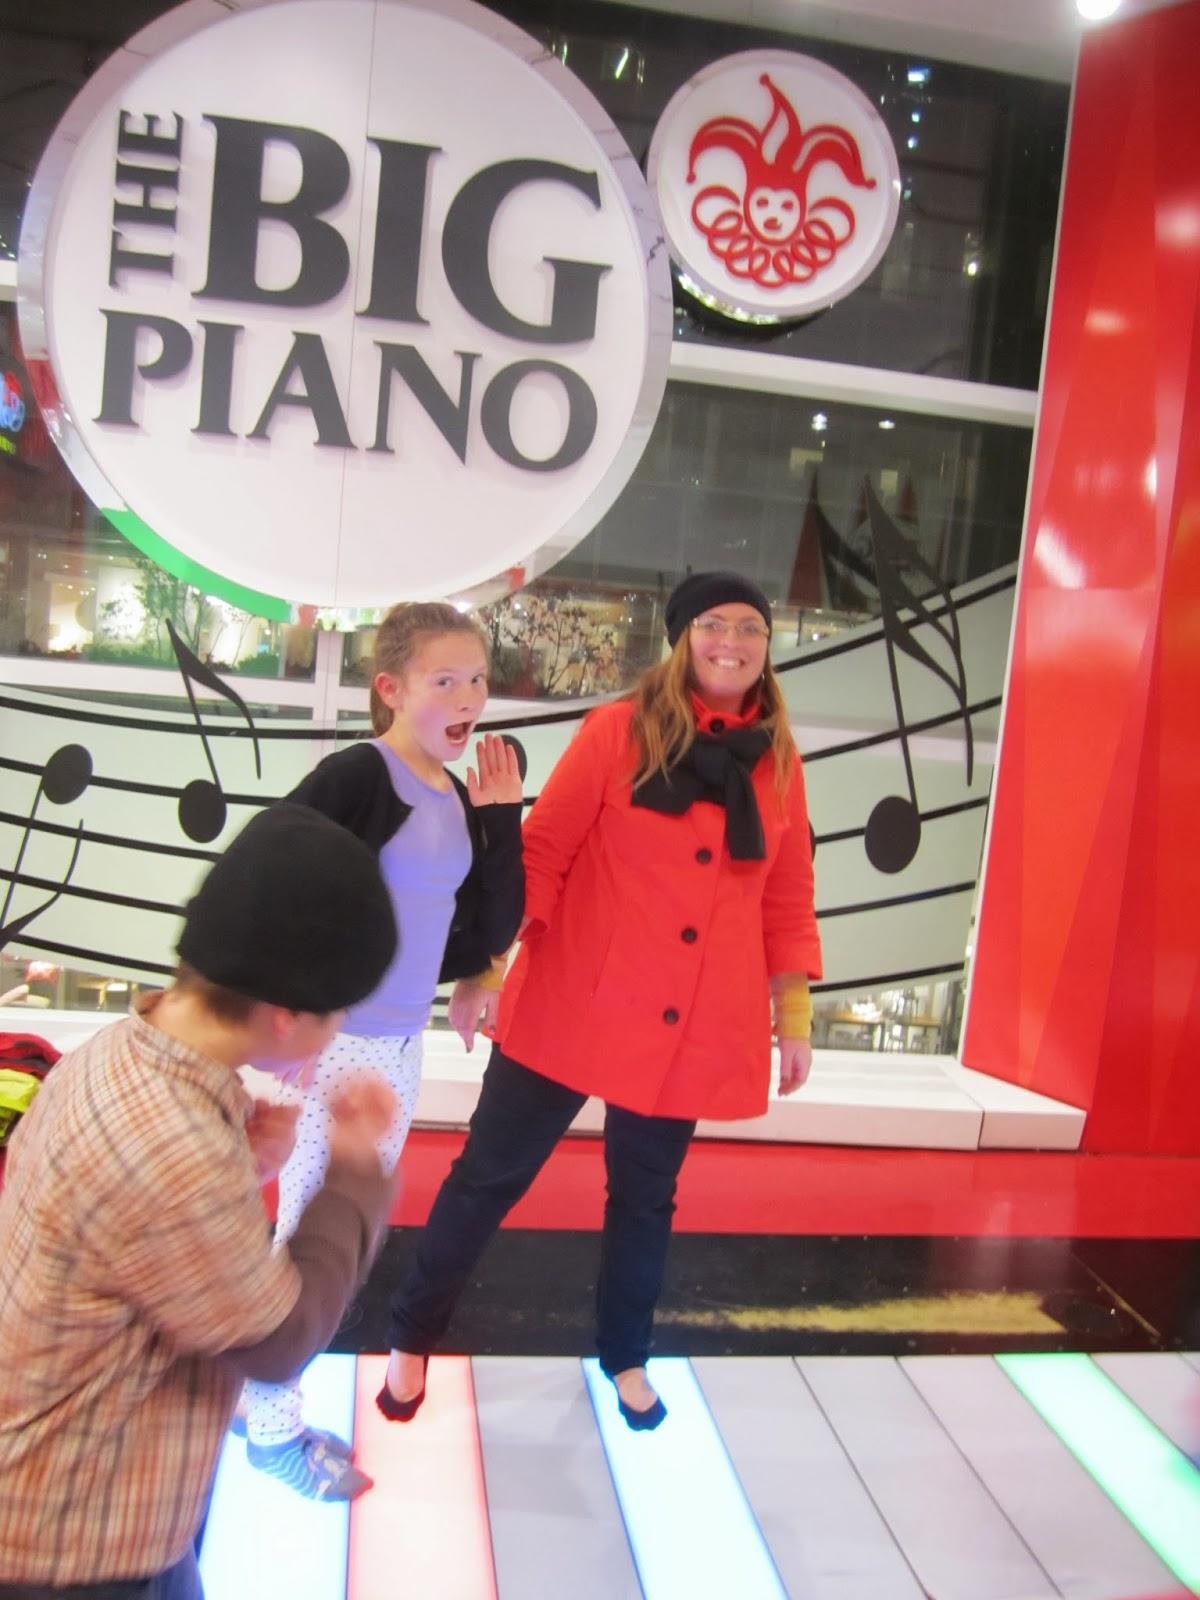 fao schwartz, new york, big piano, family smiling